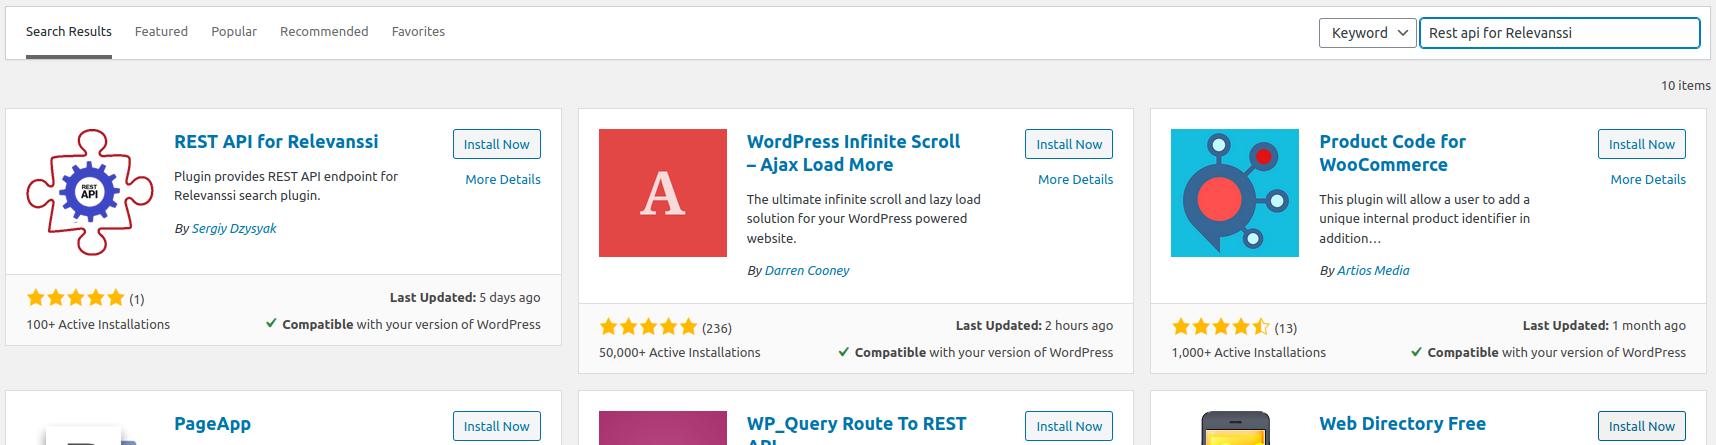 Rest API for Relevanssi installation via WordPress plugins menu